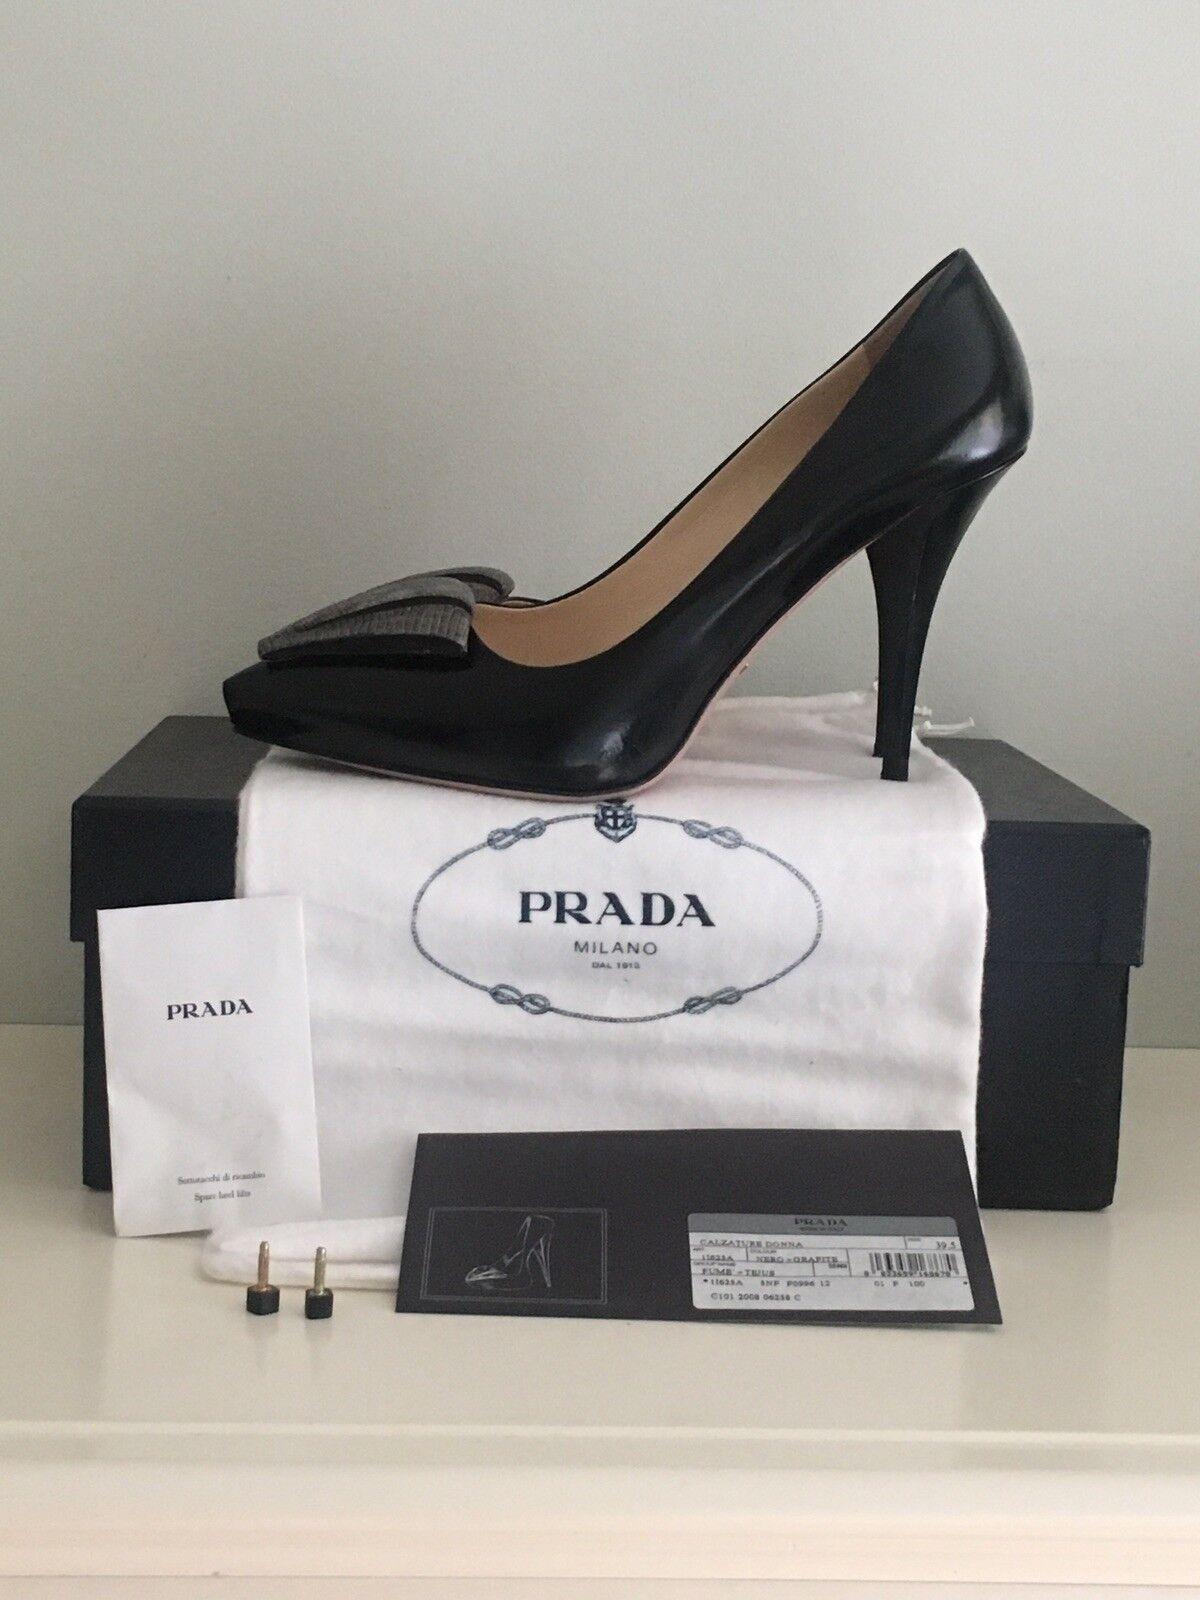 Prada Heel FemmesGreat 2Calzature 39 1 High Chaussures BerxoWdC